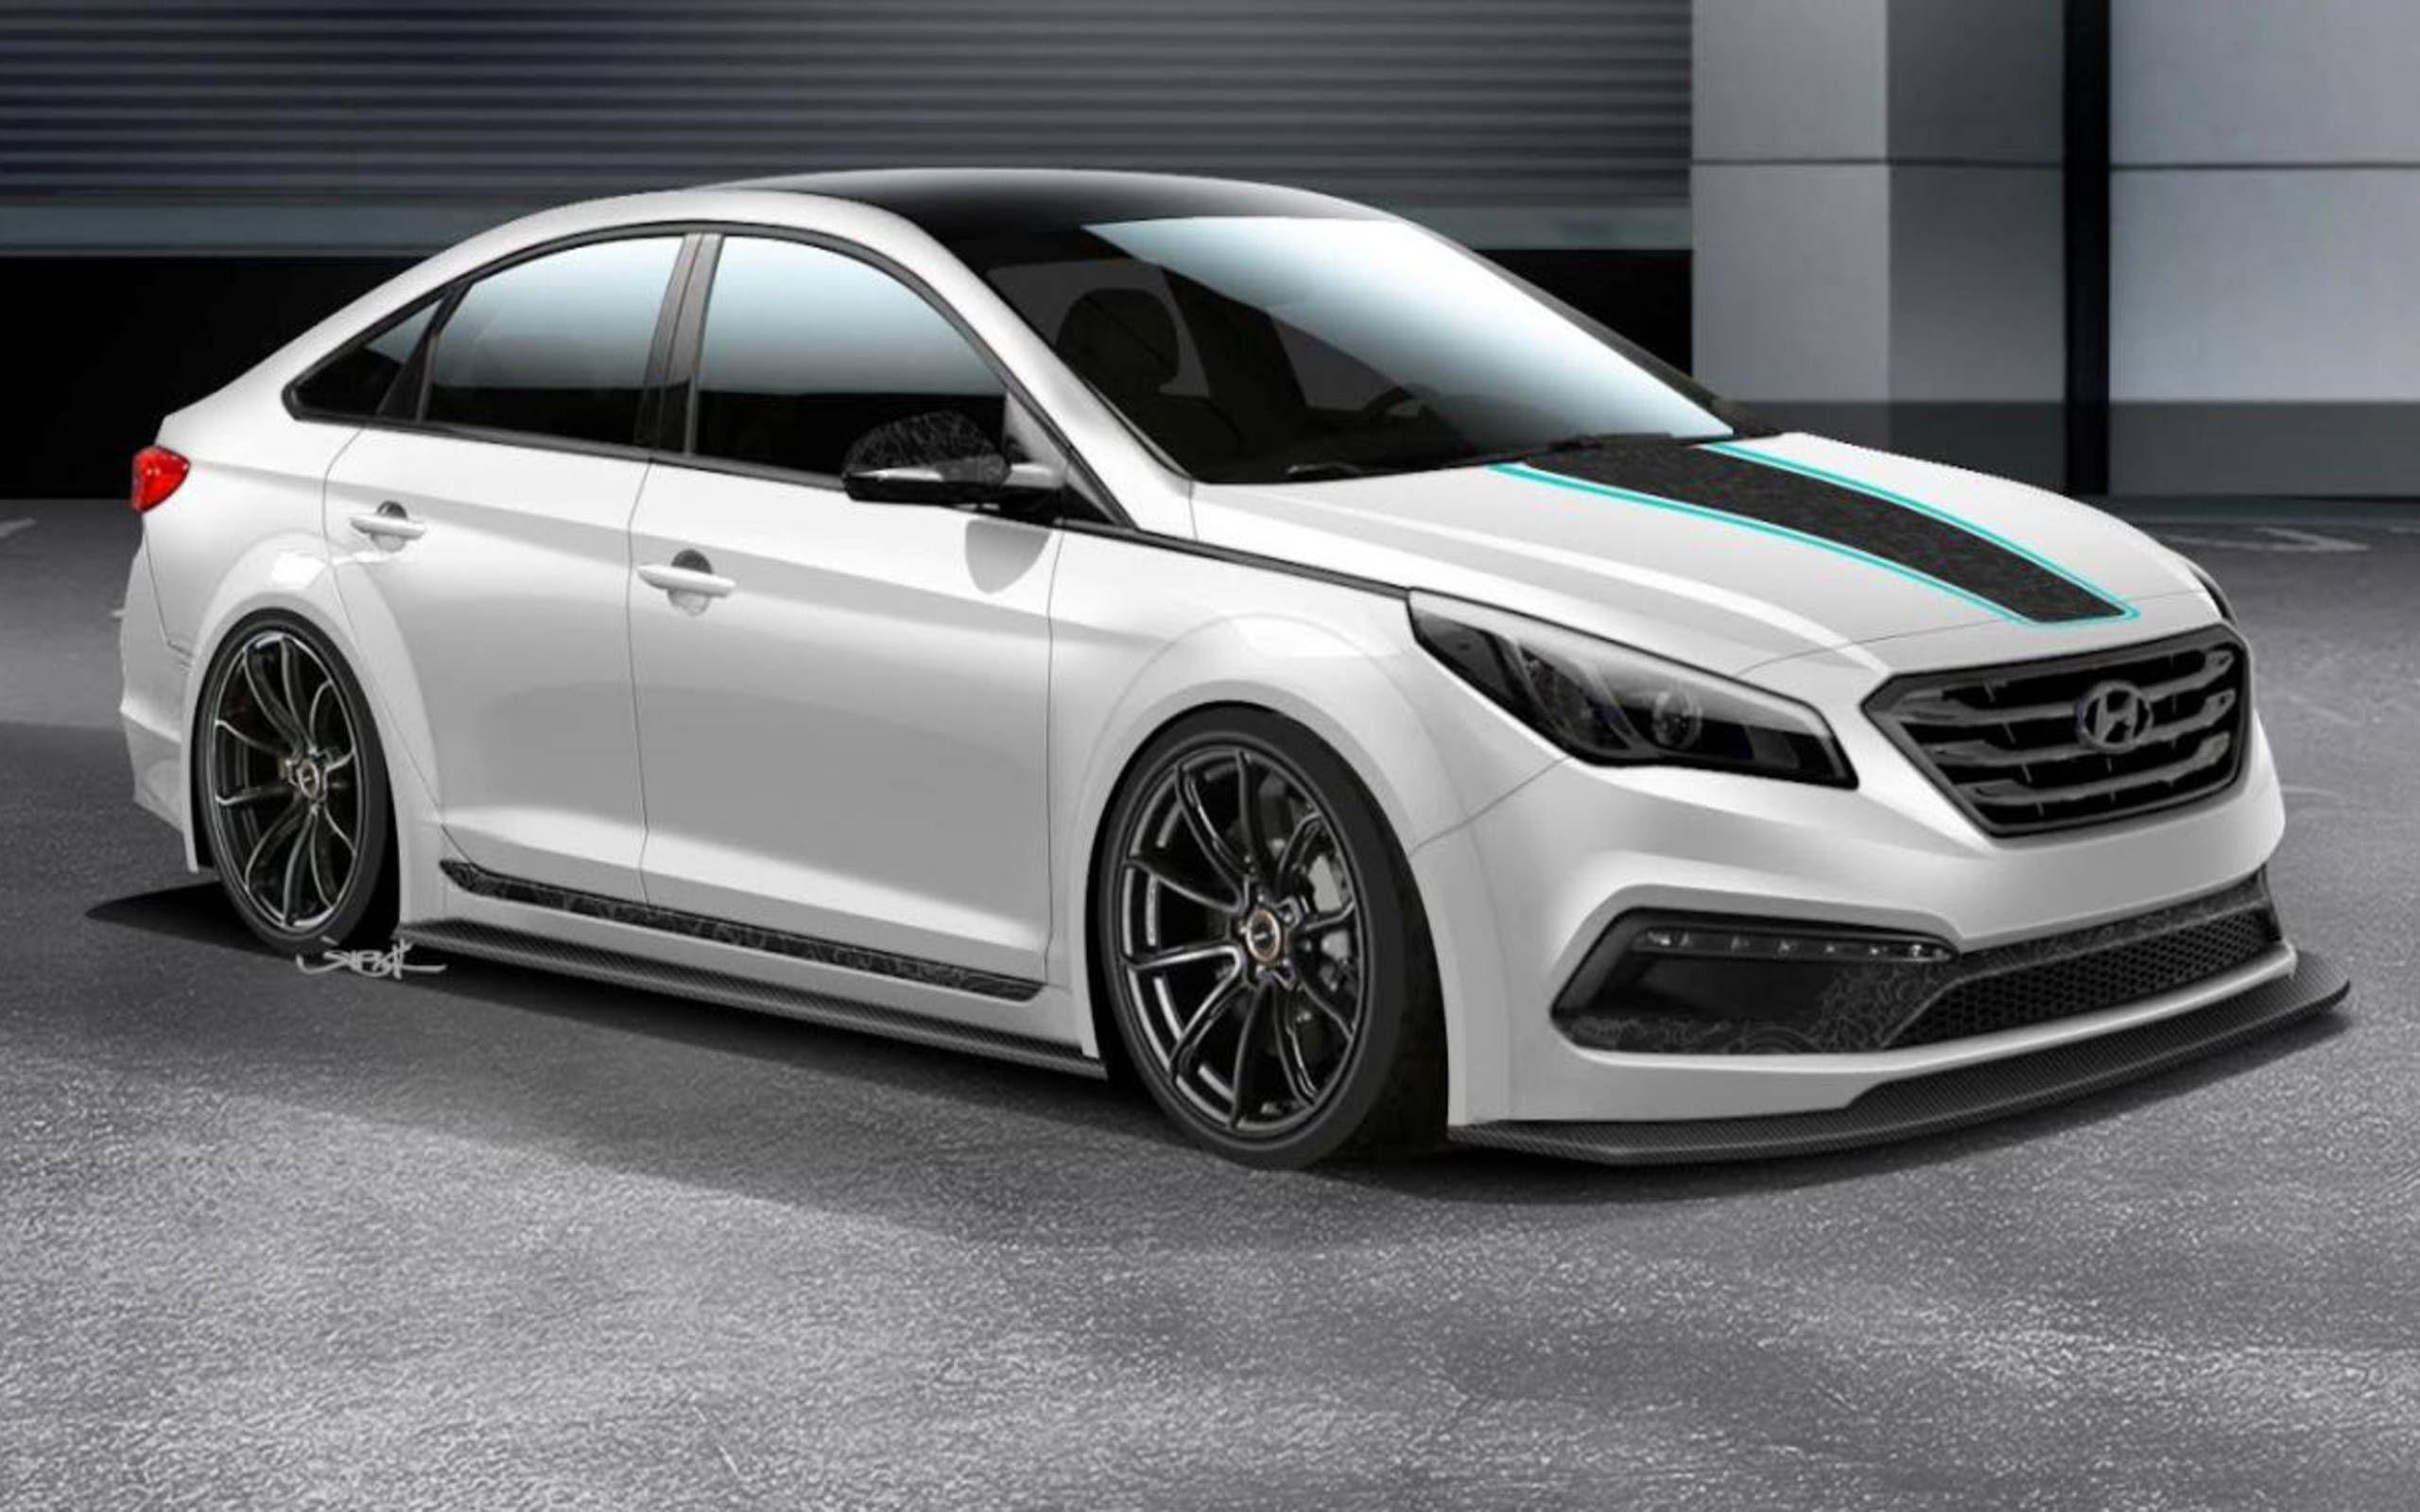 Hyundai Jp Edition Sonata Previewed Before The Sema Show